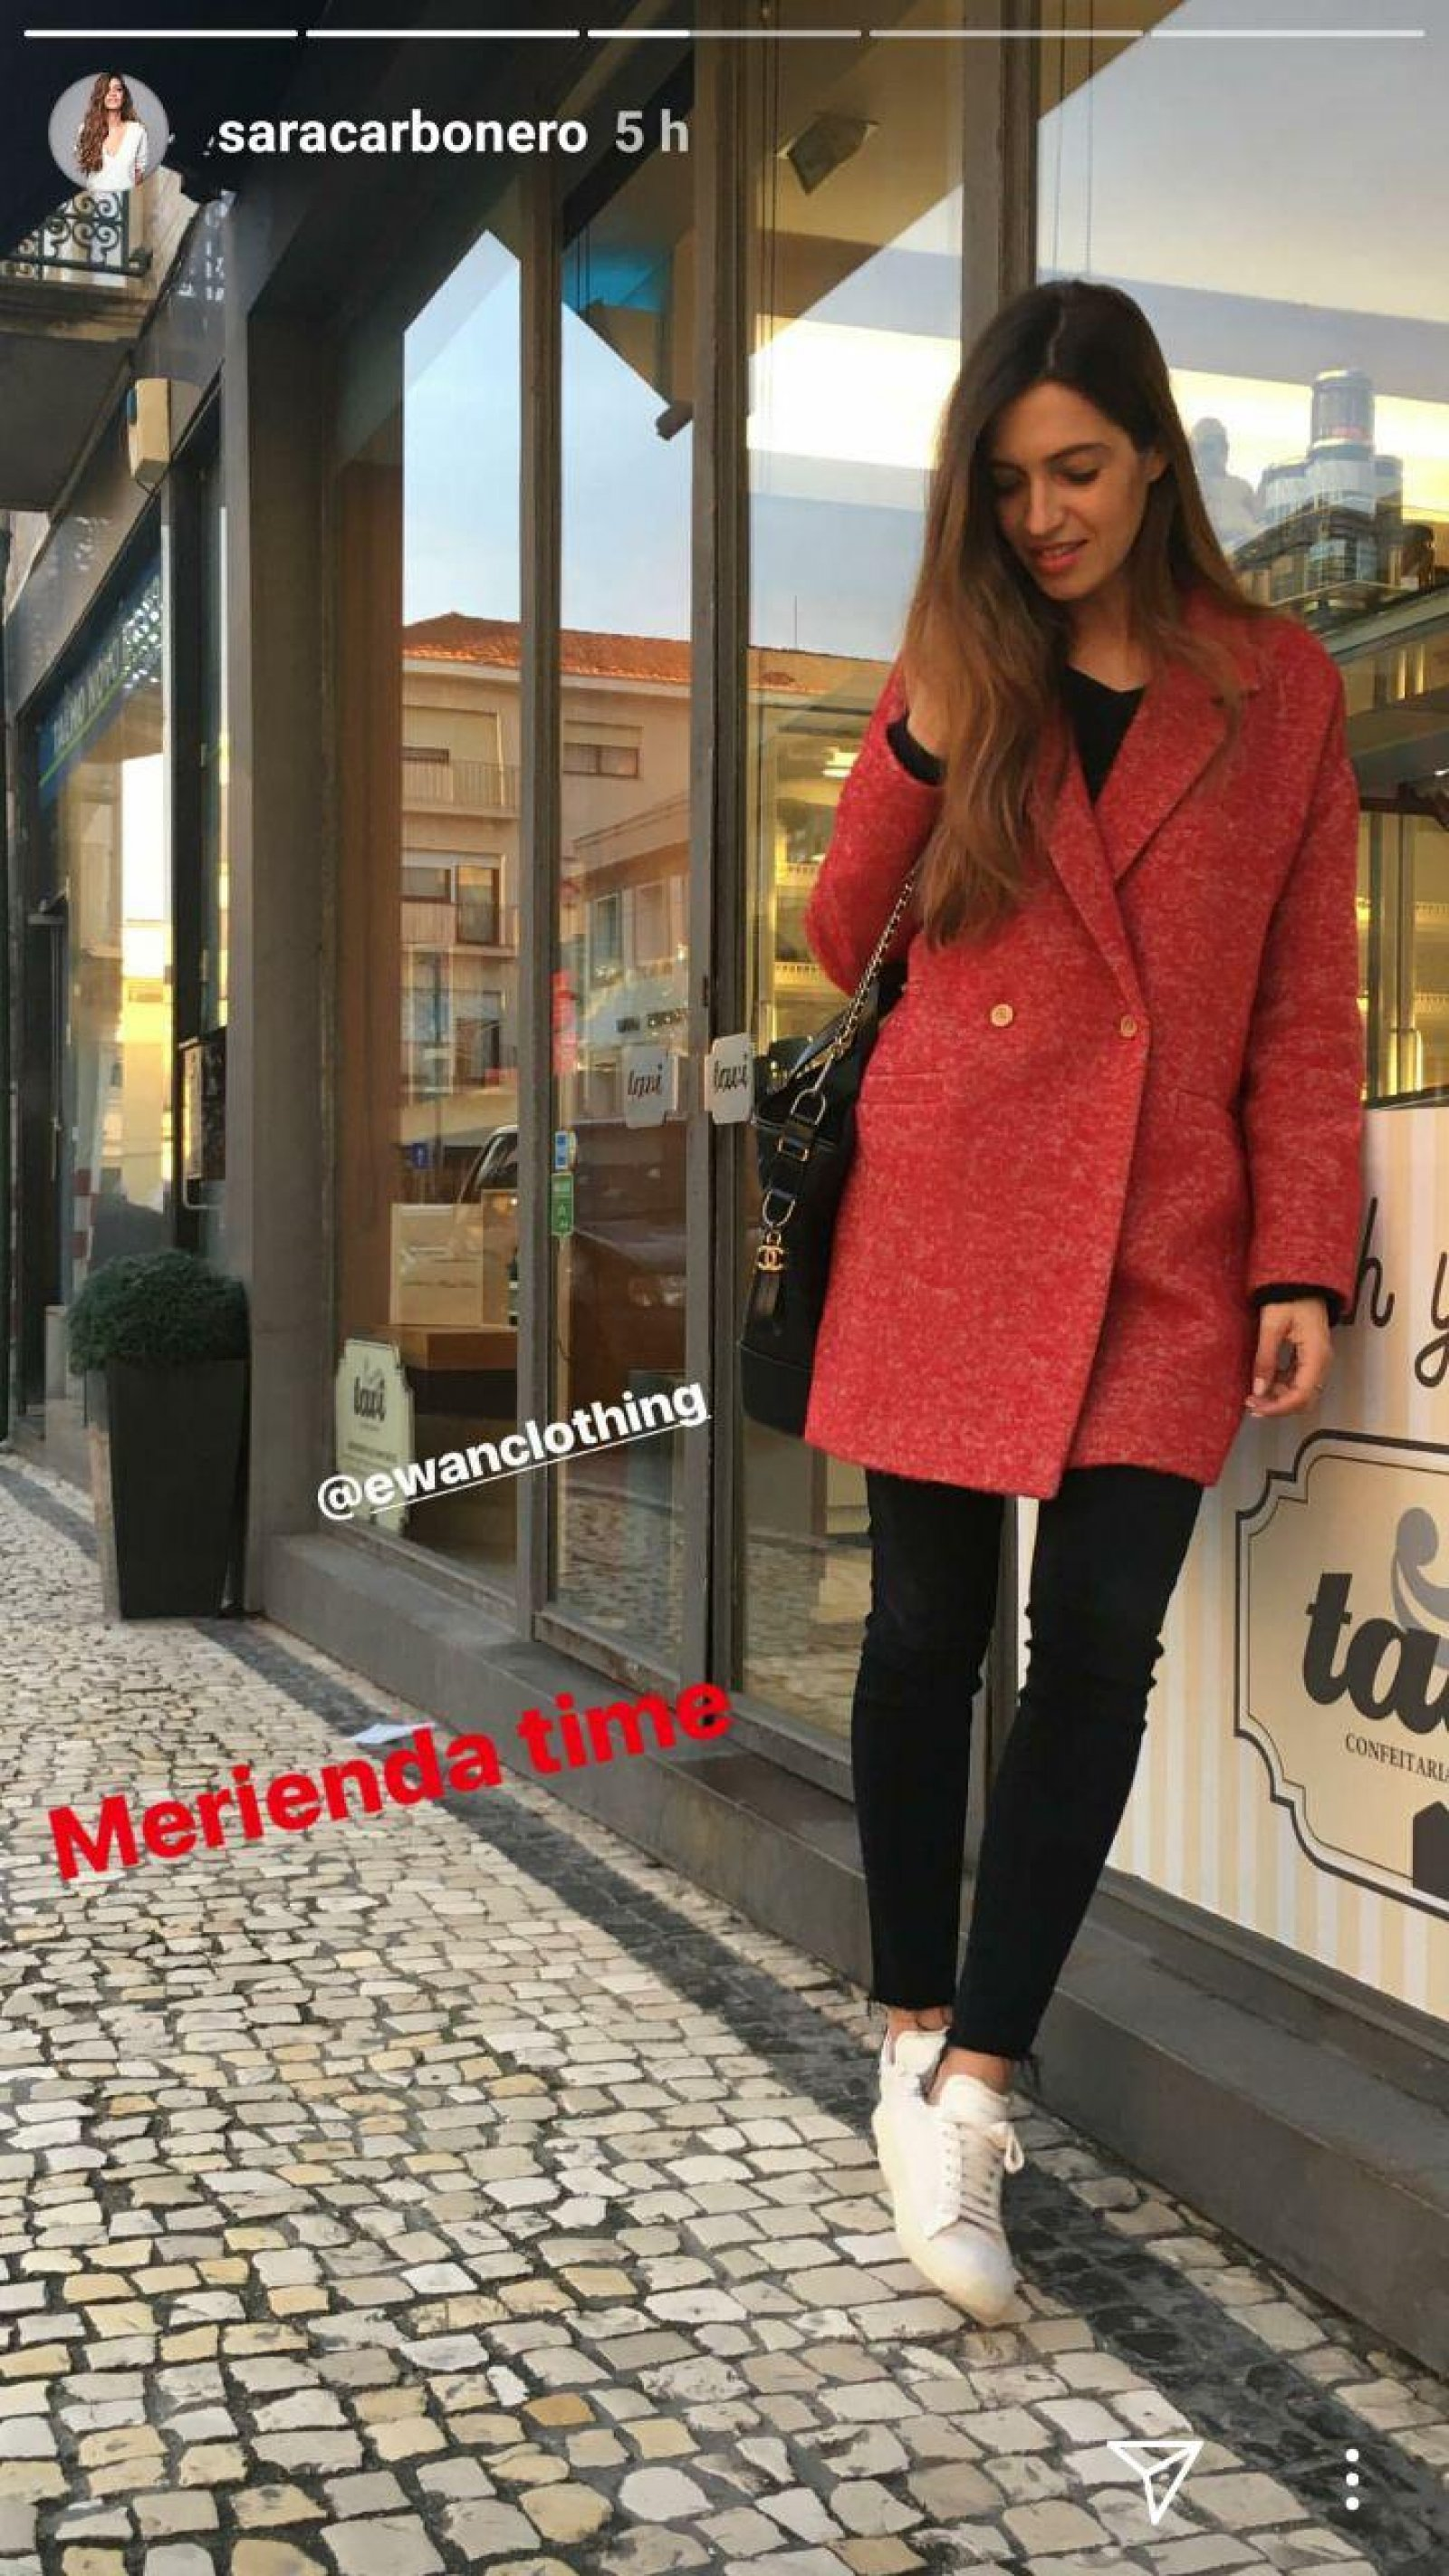 Captura de la imagen publicada por Sara Carbonero mostrando su abrigo